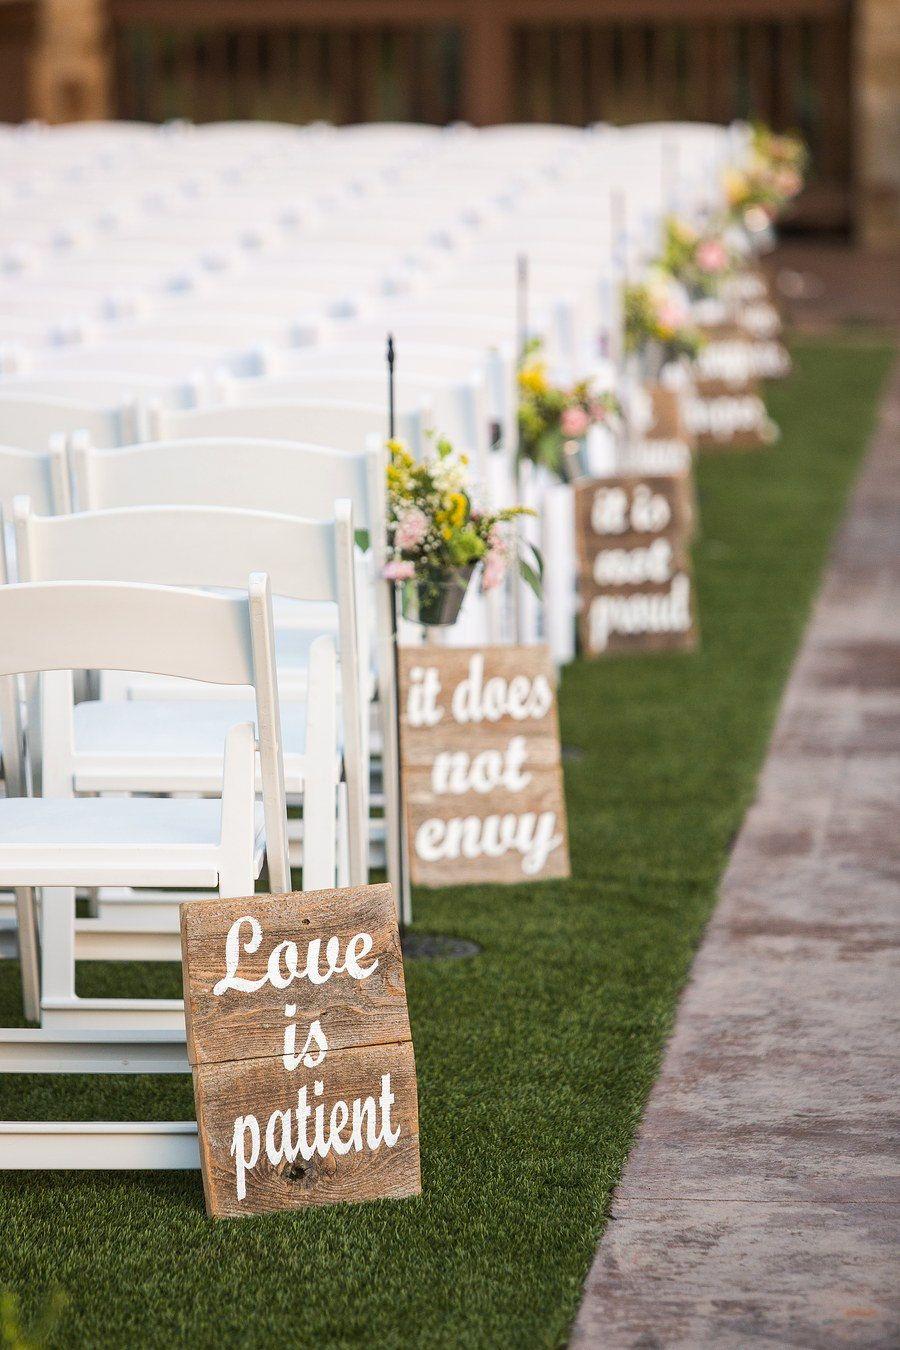 10 Gorgeous Wedding Signs We Love on Etsy | Pinterest | Etsy ...